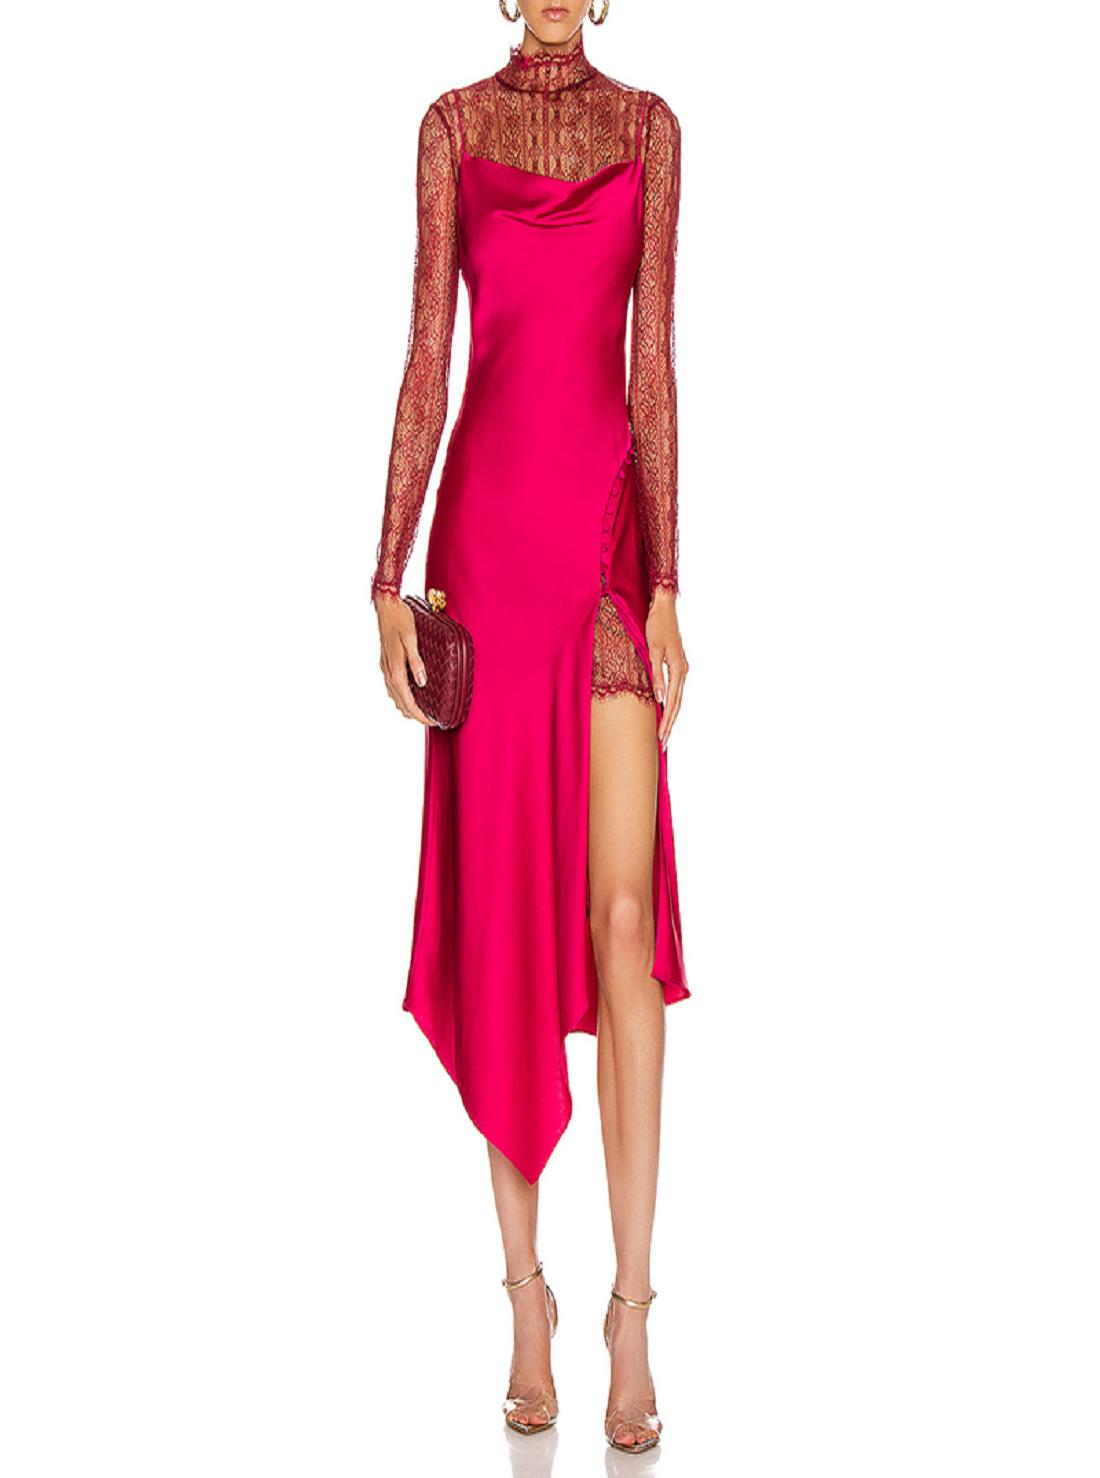 7 Wholesale Long Sleeve Satin Dress